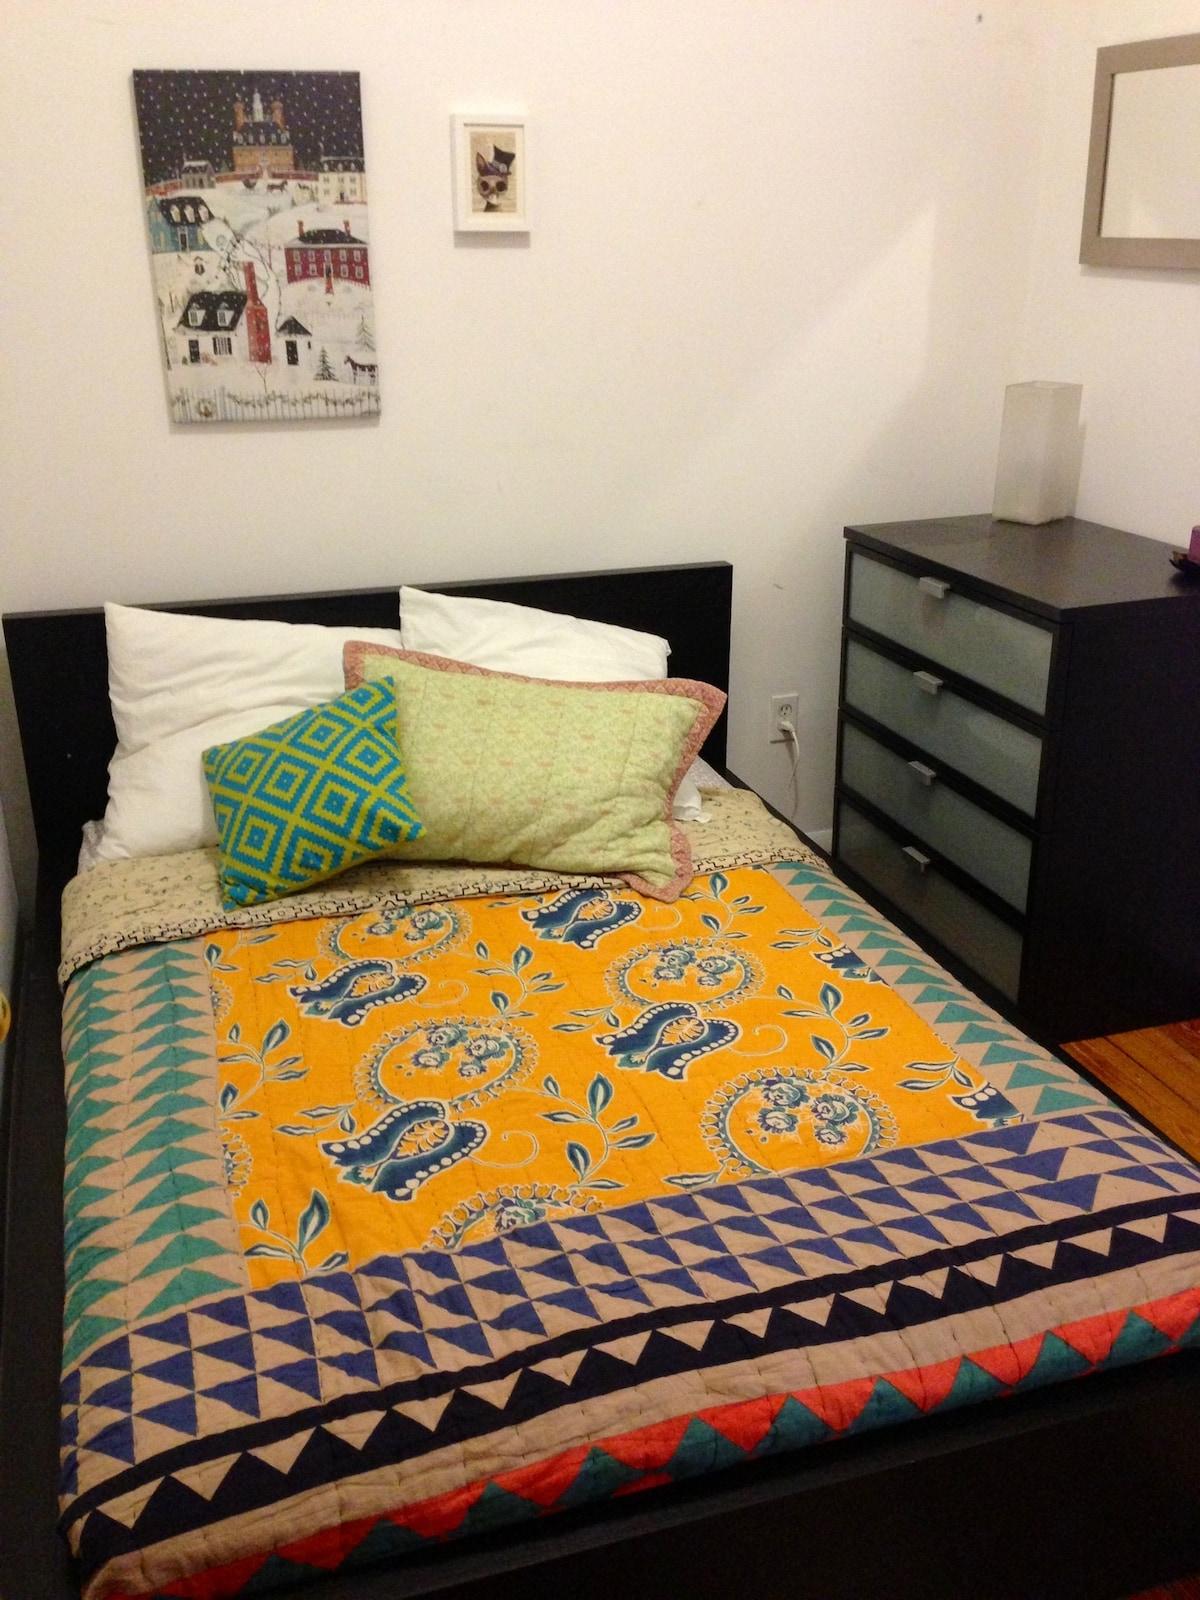 Private Room in 2 Bedroom UWS Apt